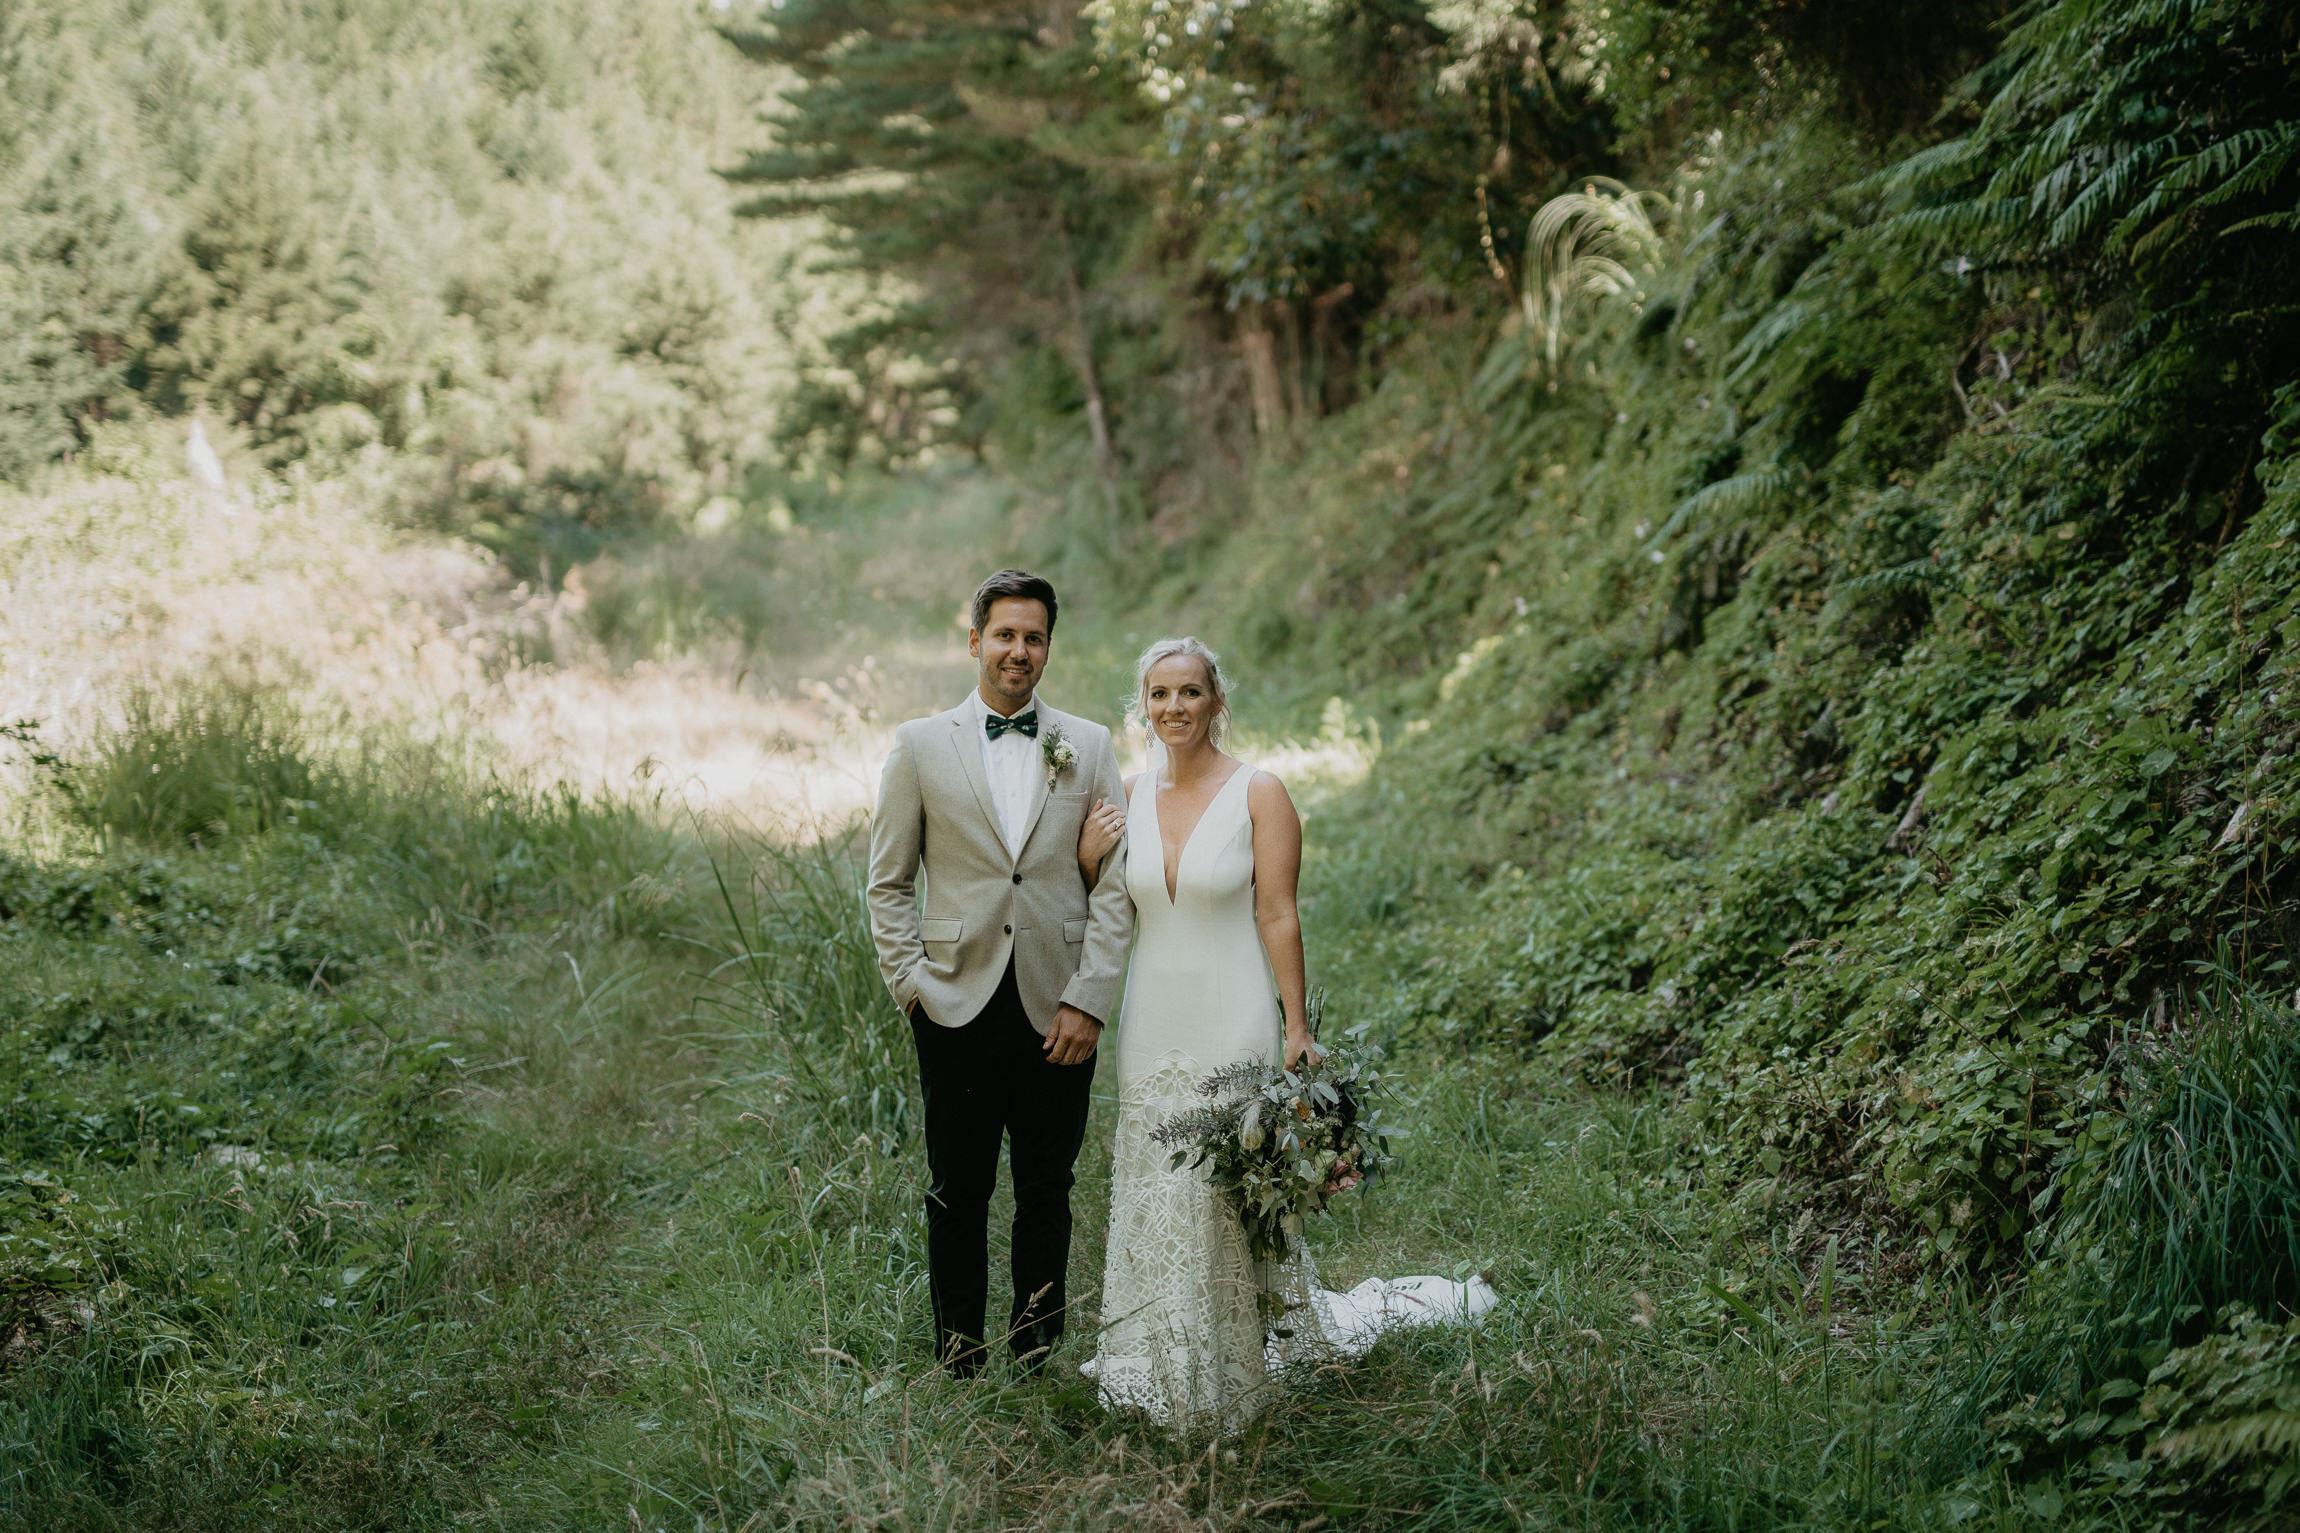 oldforestschool-wedding-blog-76.jpg